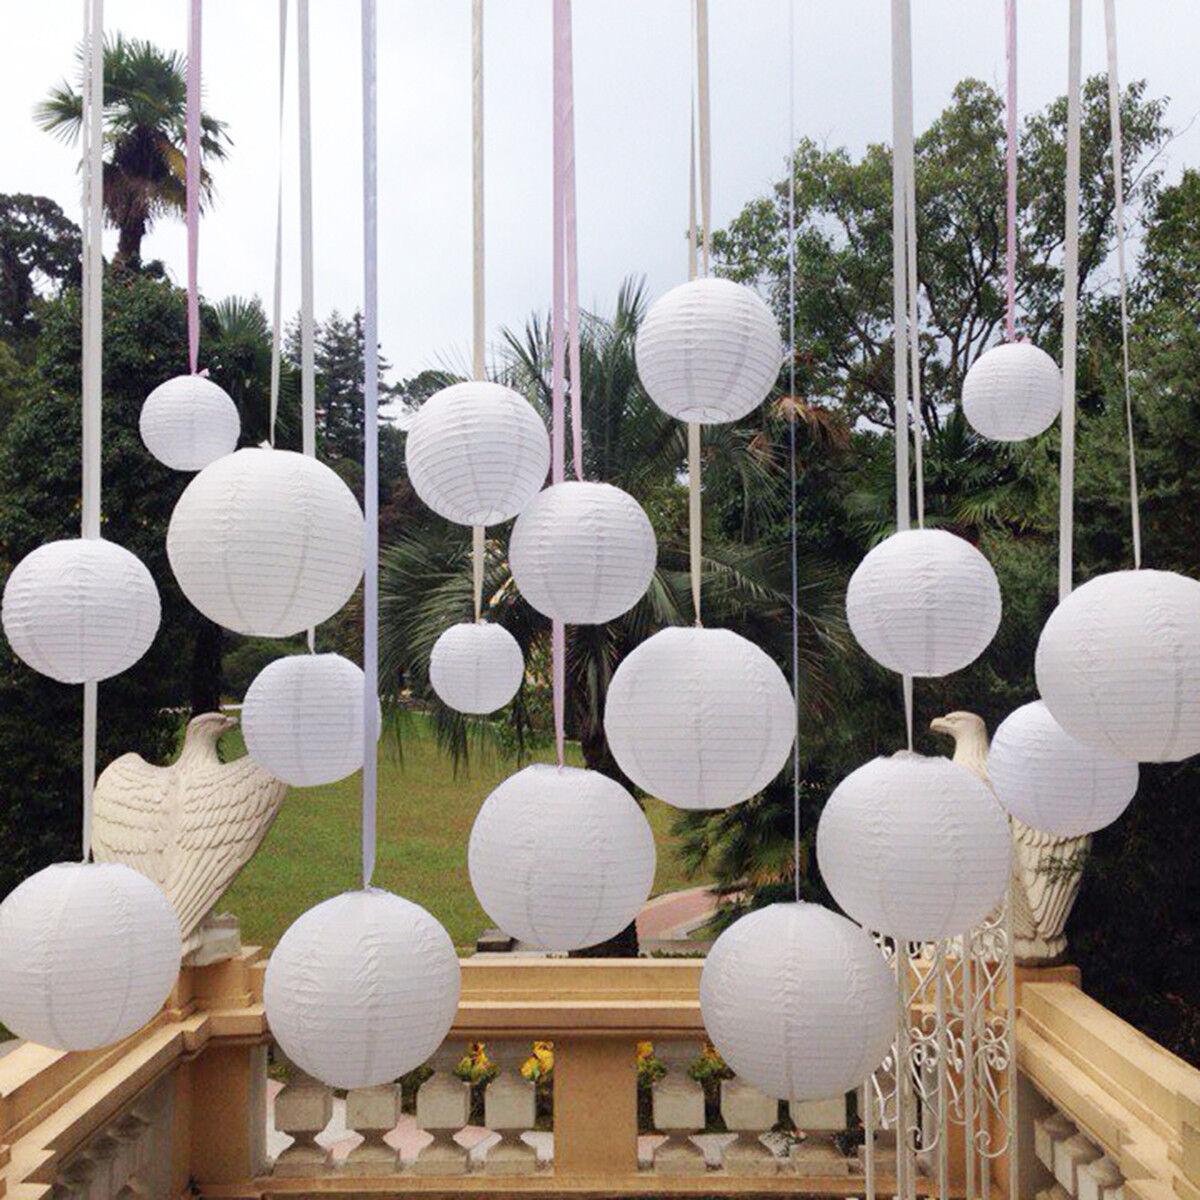 "20pc White Paper Lanterns Party Decorations 10"" Wedding Venu"